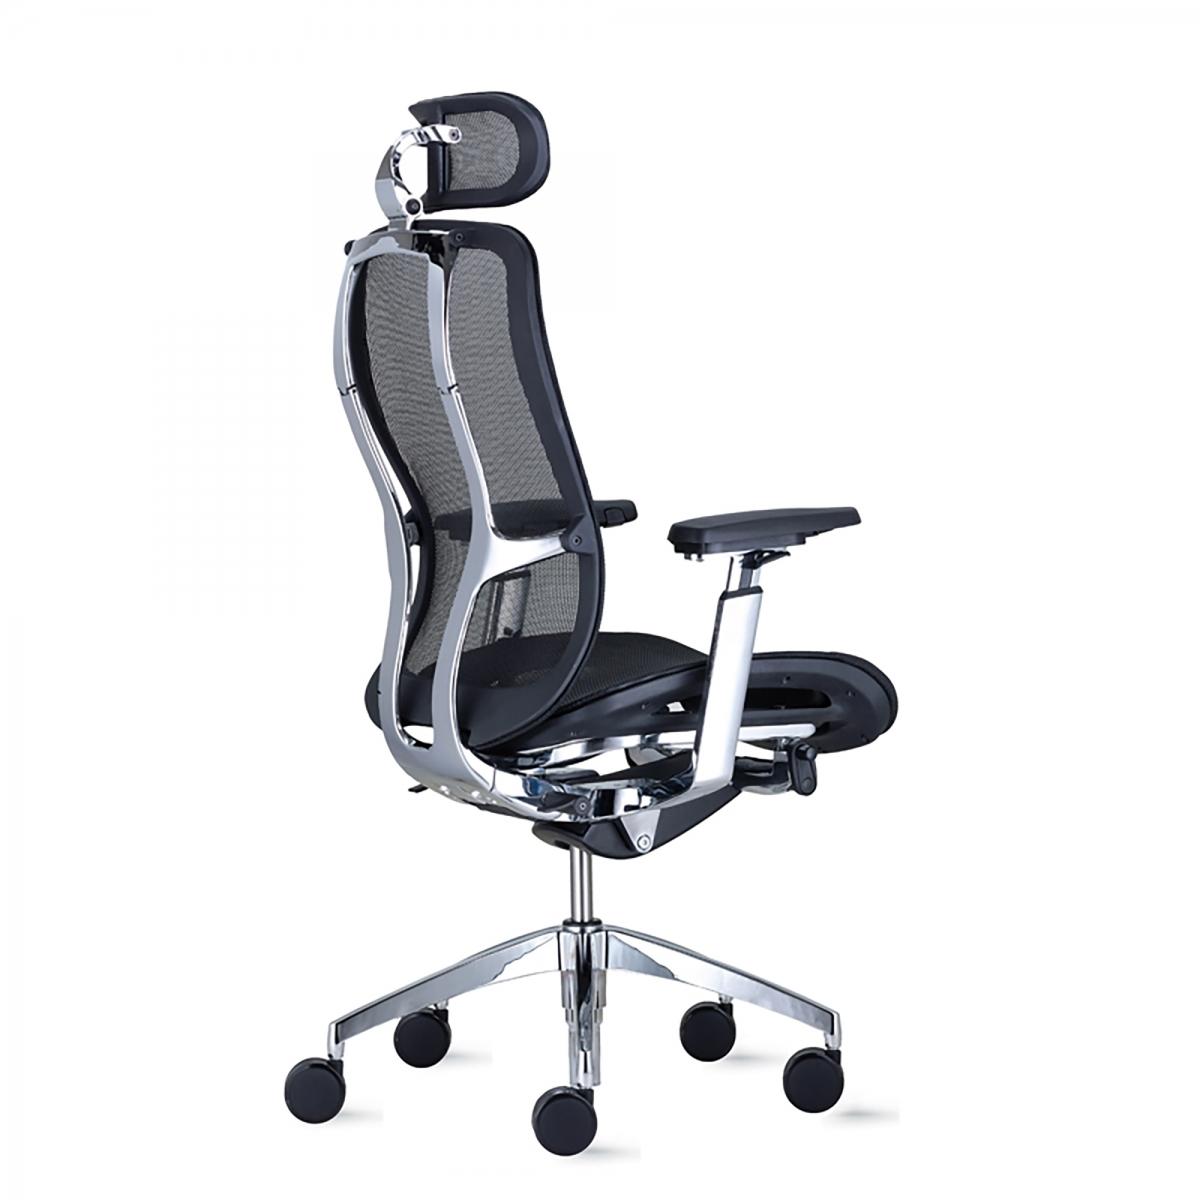 Vesta Executive Ergonomic Mesh Chair